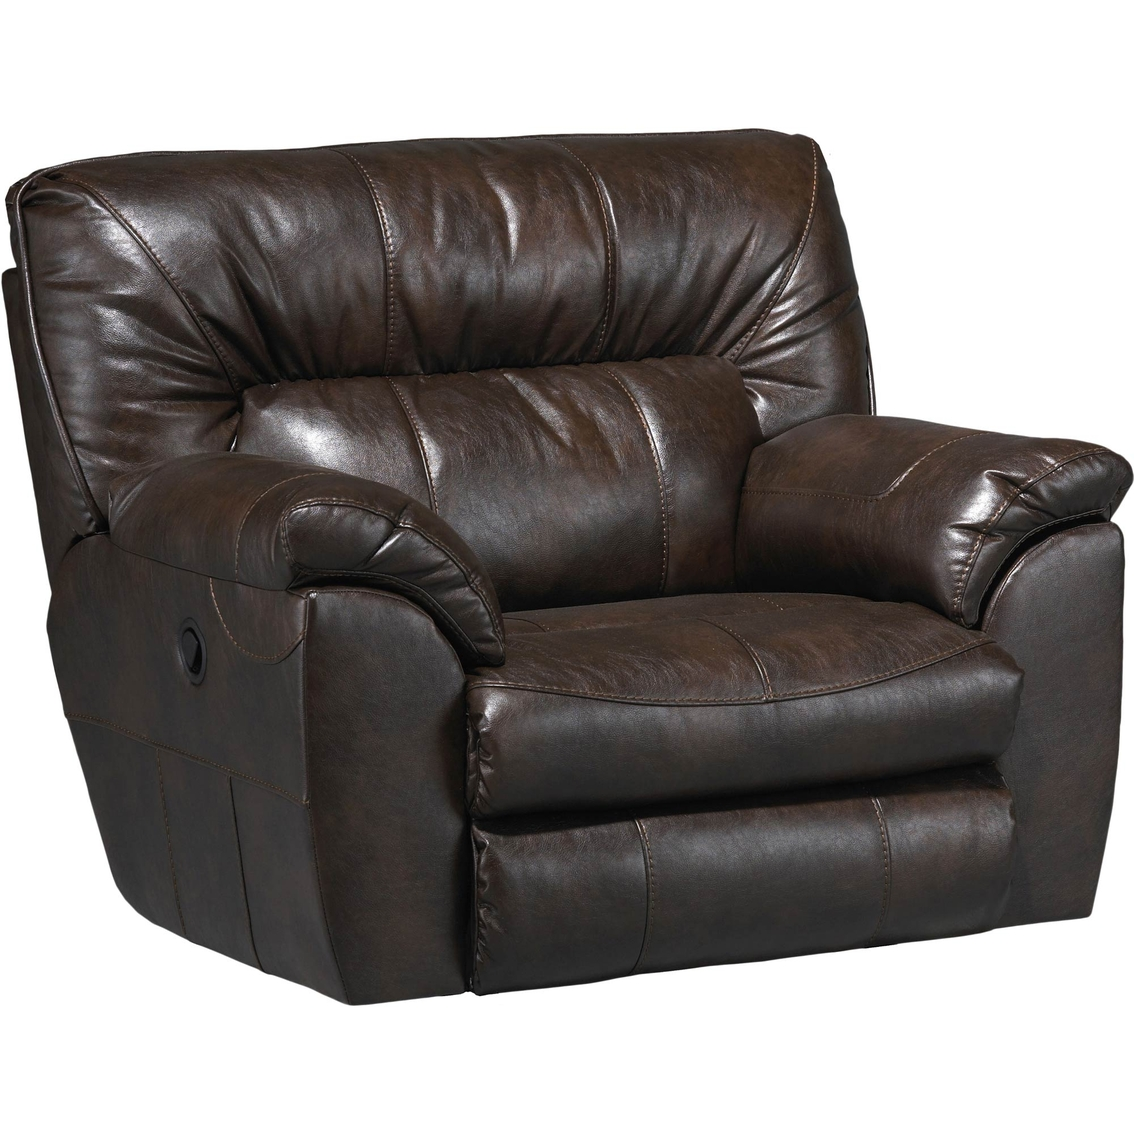 nolan power reclining sofa fundas para sofas en lima peru catnapper extra wide recliner chairs